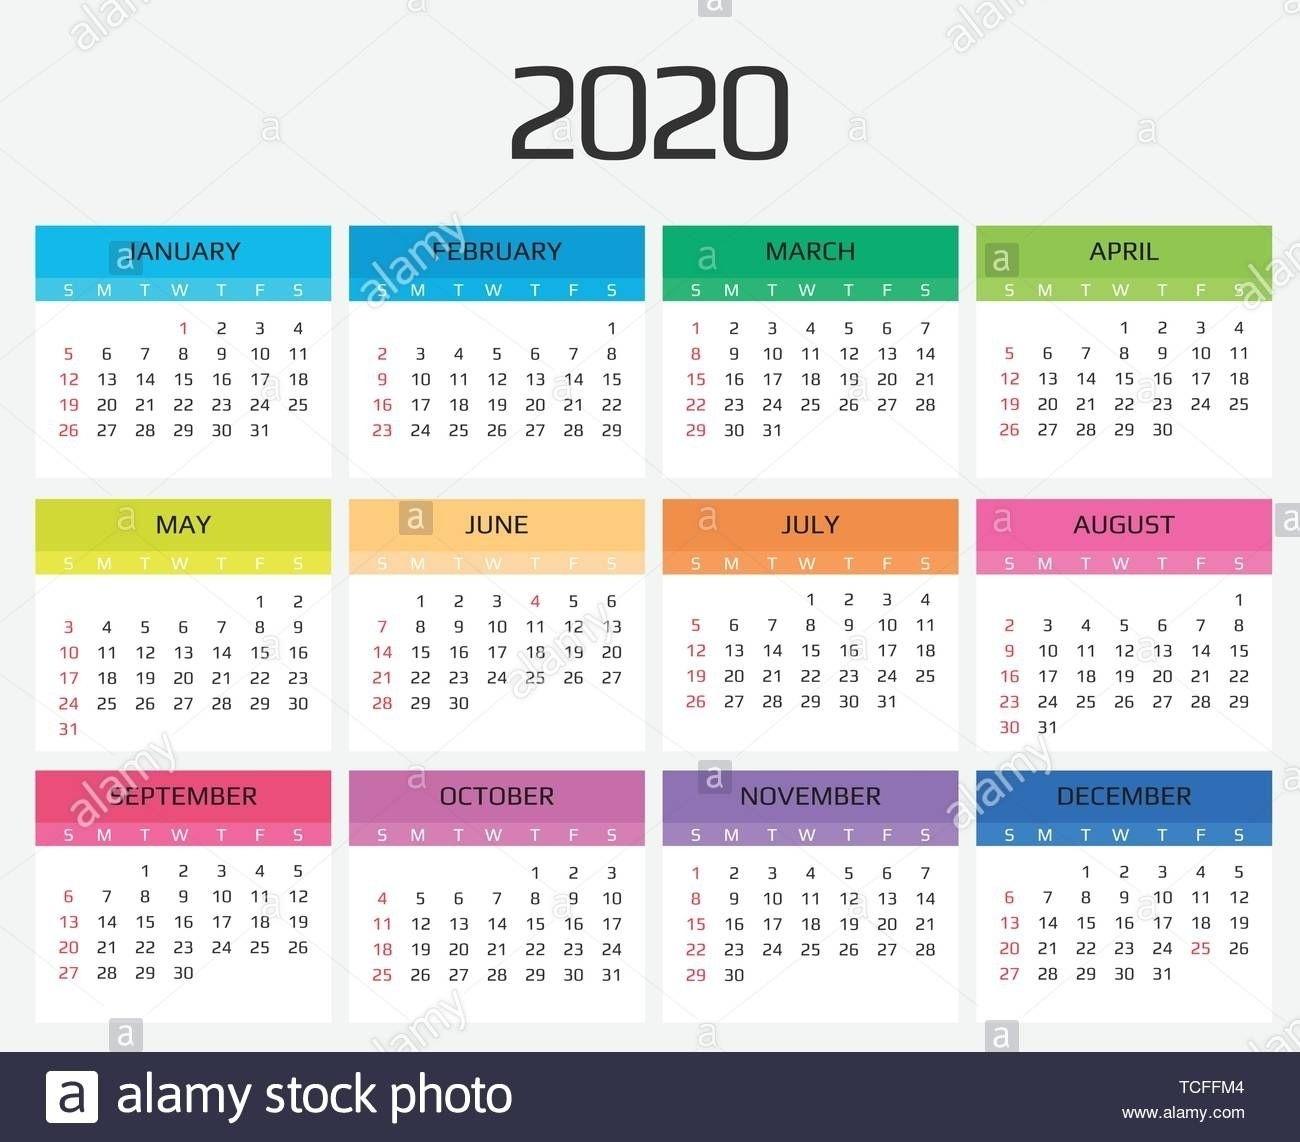 Dashing 2020 Calendar Hong Kong Template In 2020   Calendar Hong Kong Calendar 2021 Template